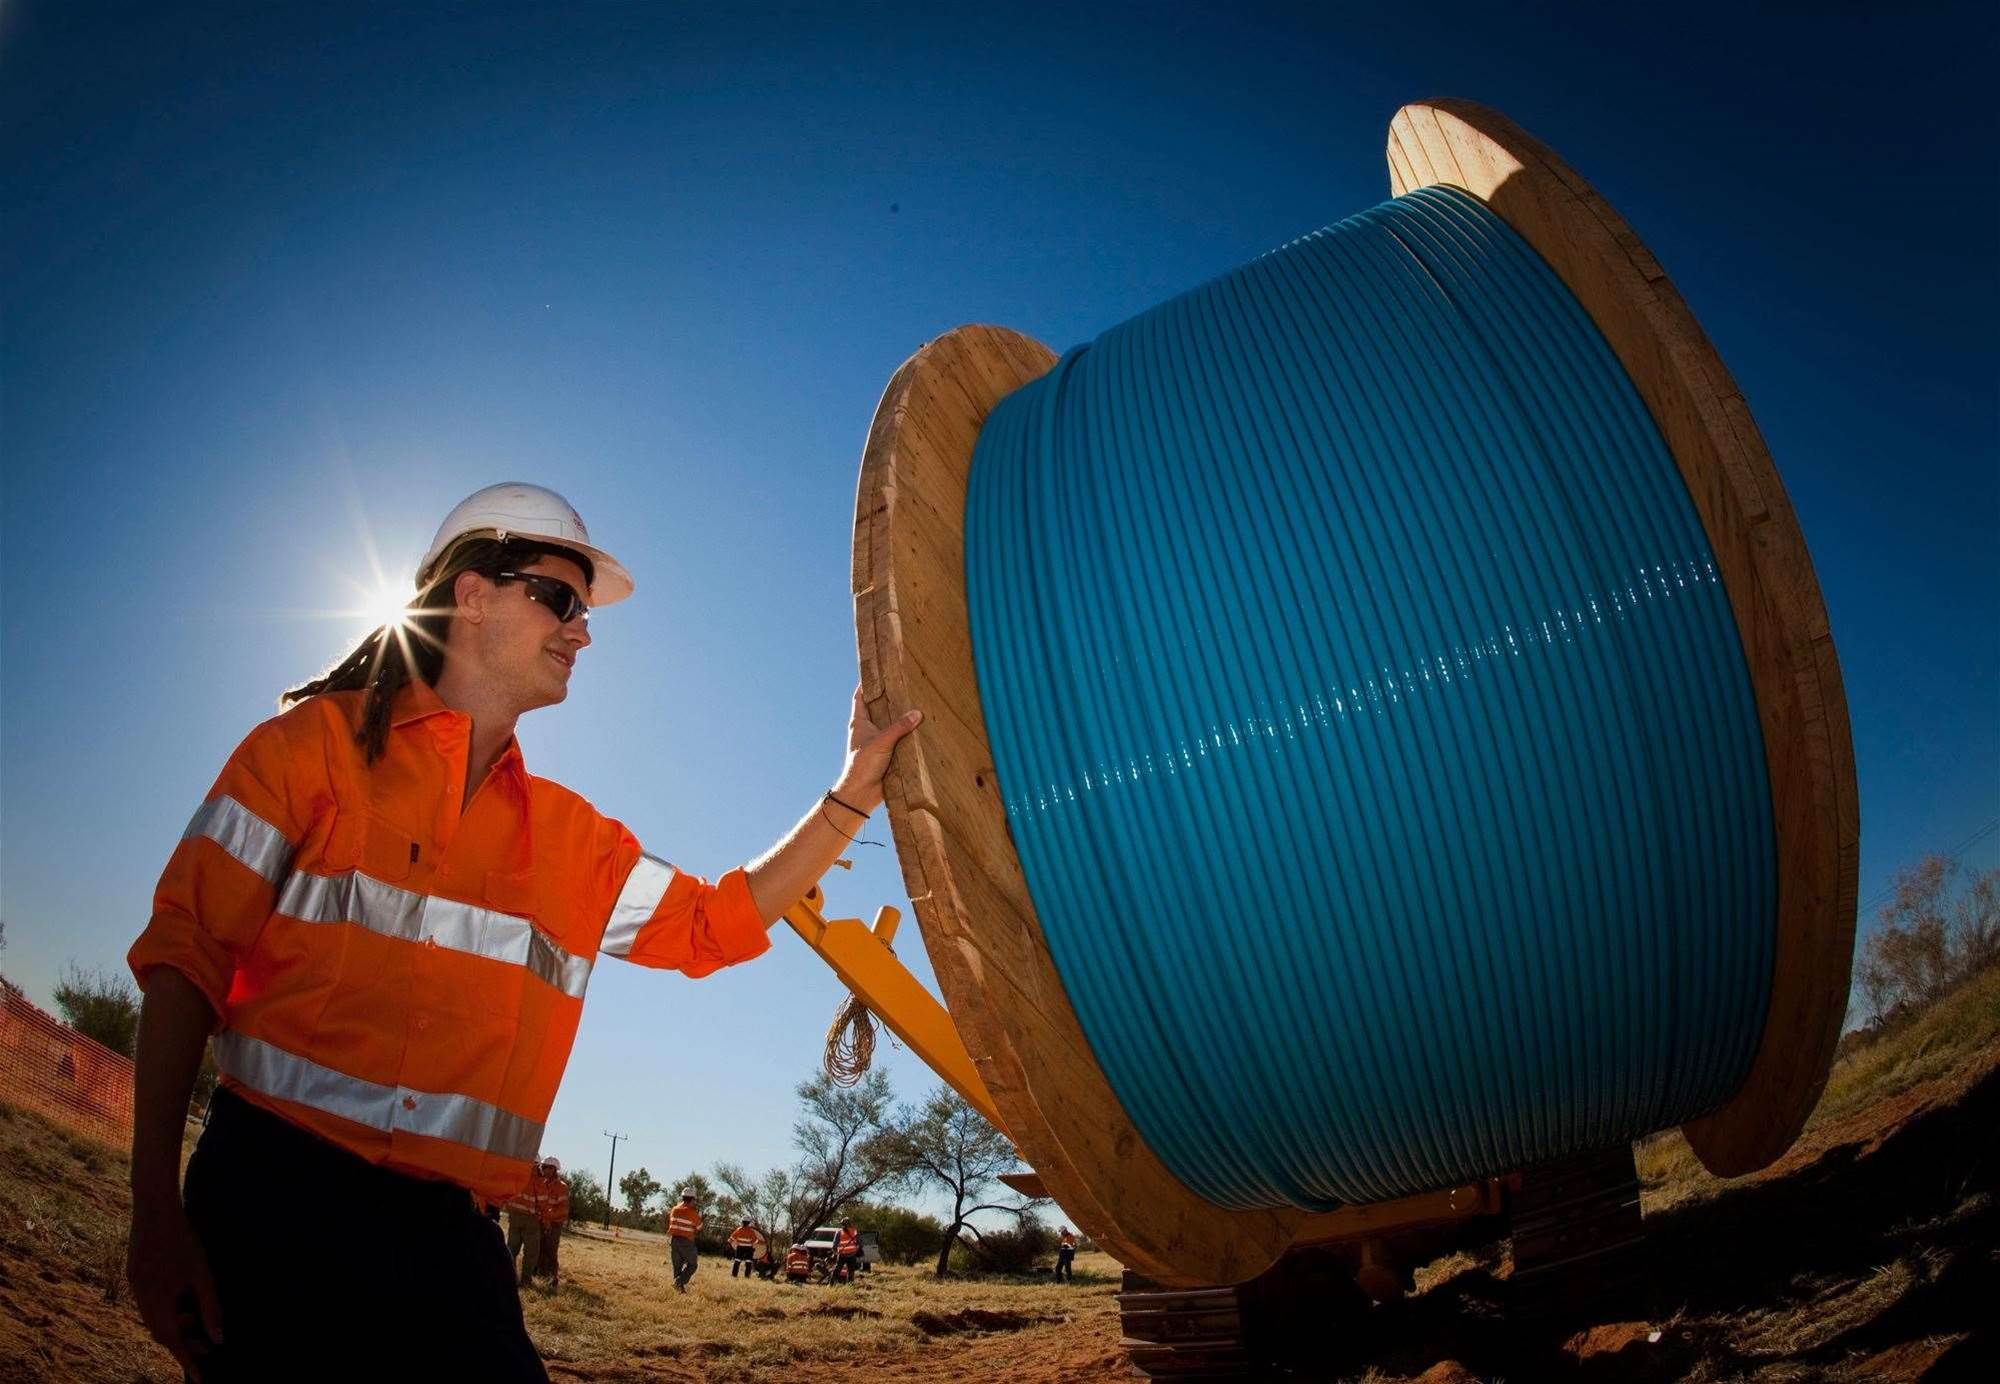 Nextgen trials 400Gbps Sydney-Canberra link